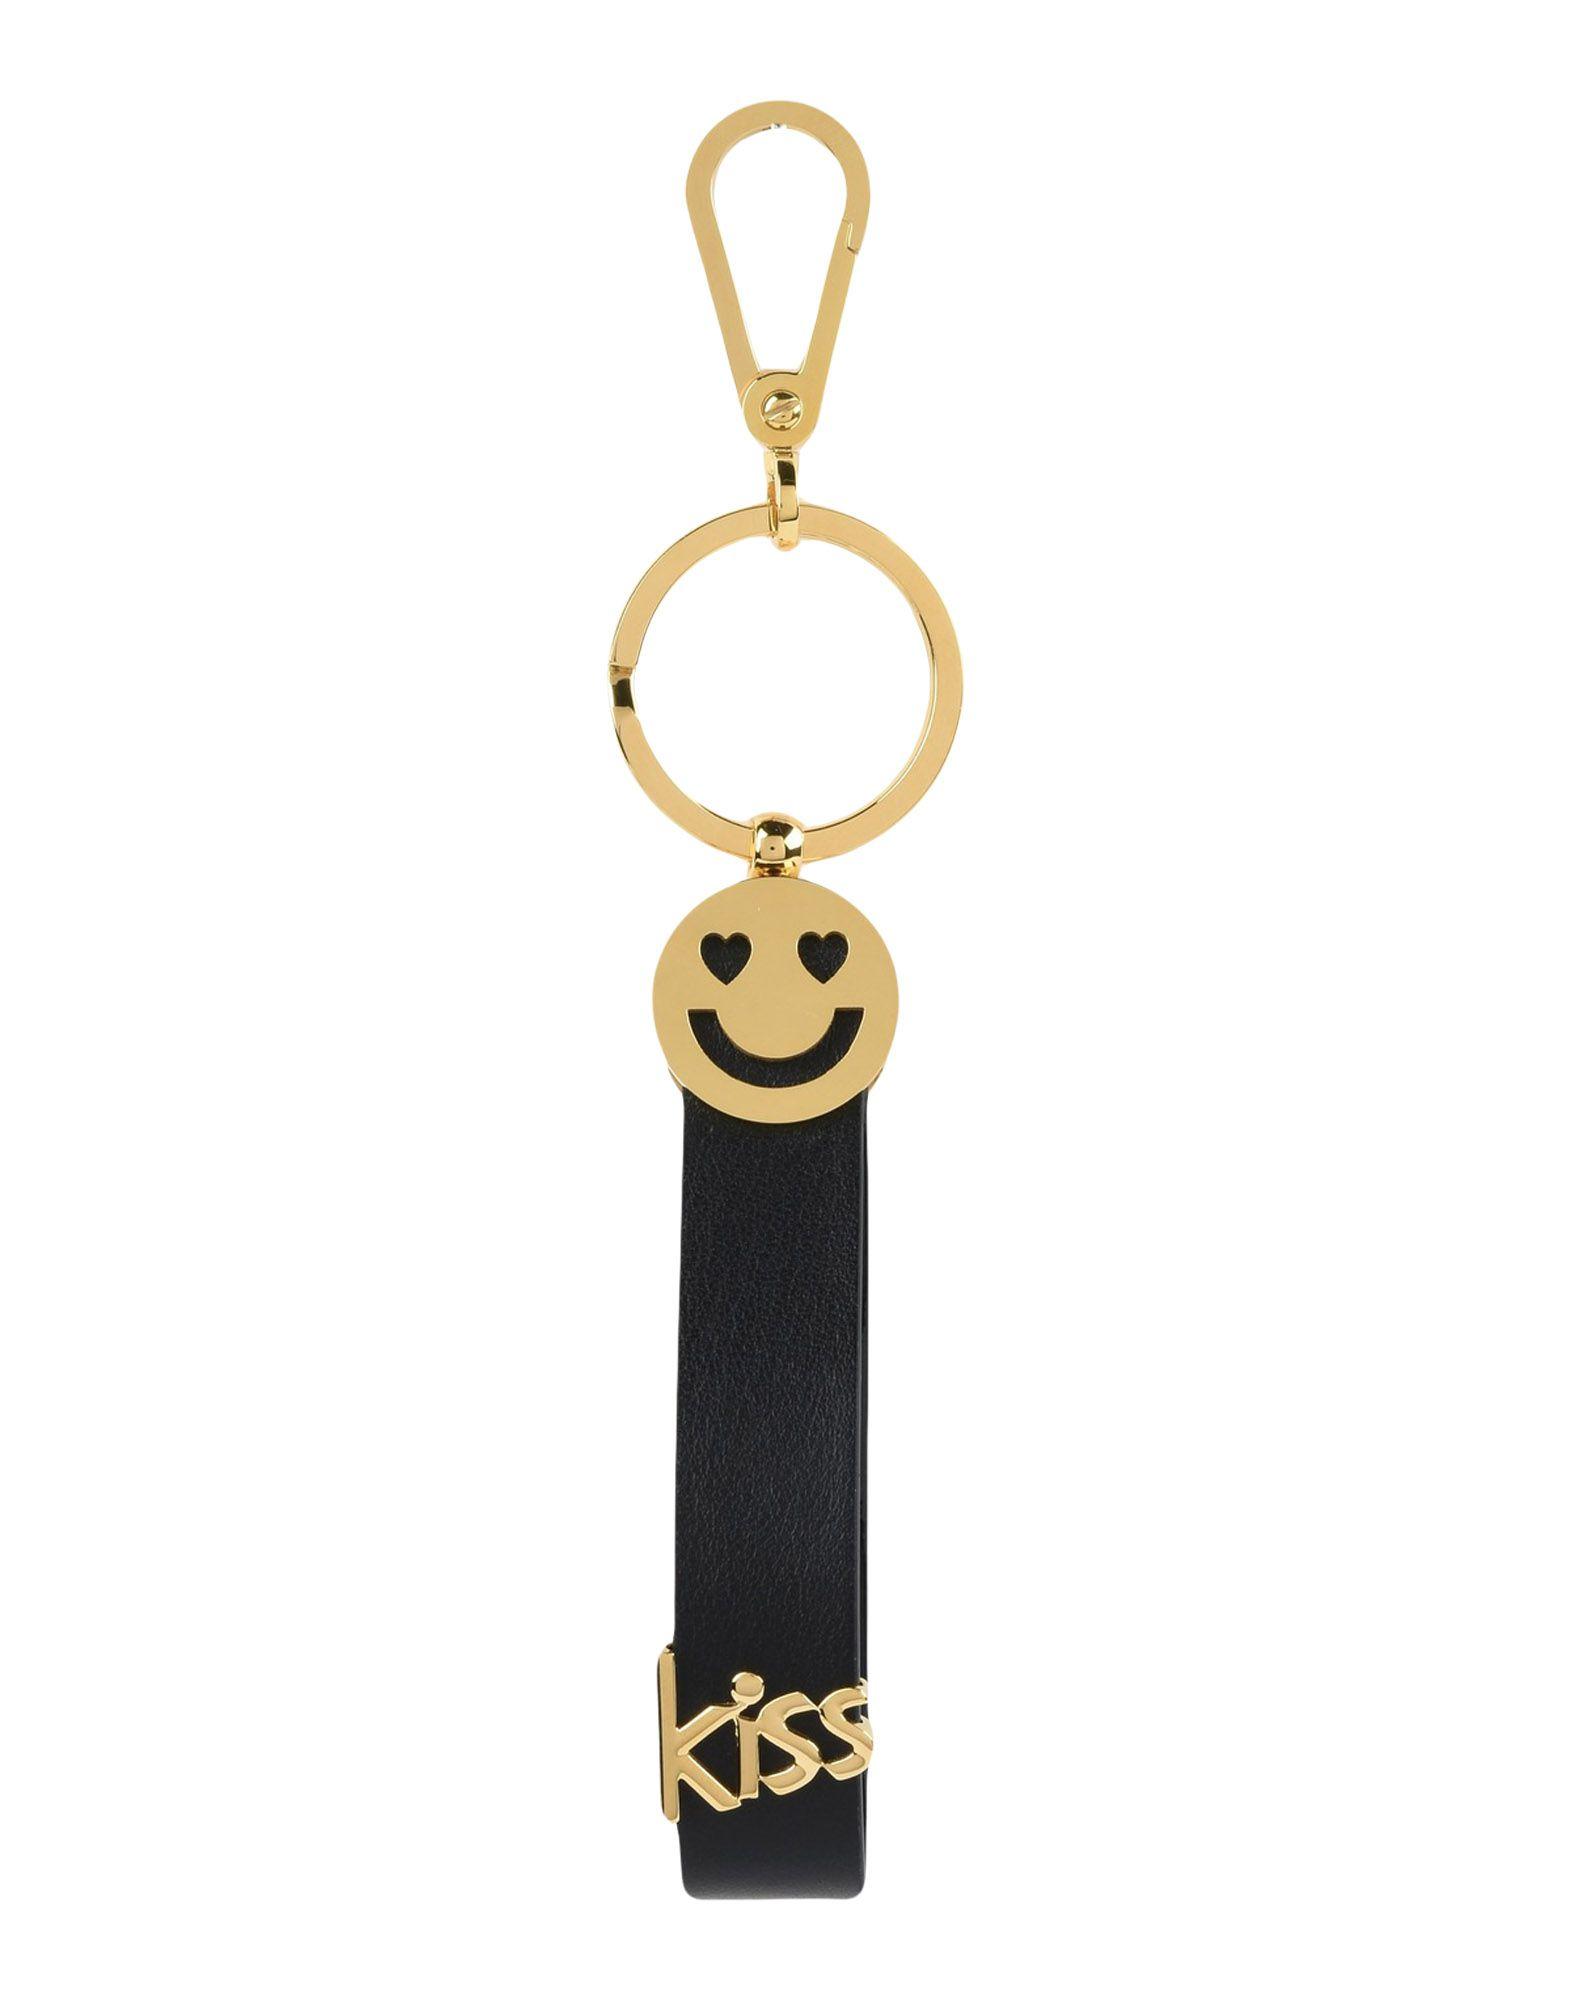 RUIFIER Key Ring in Black